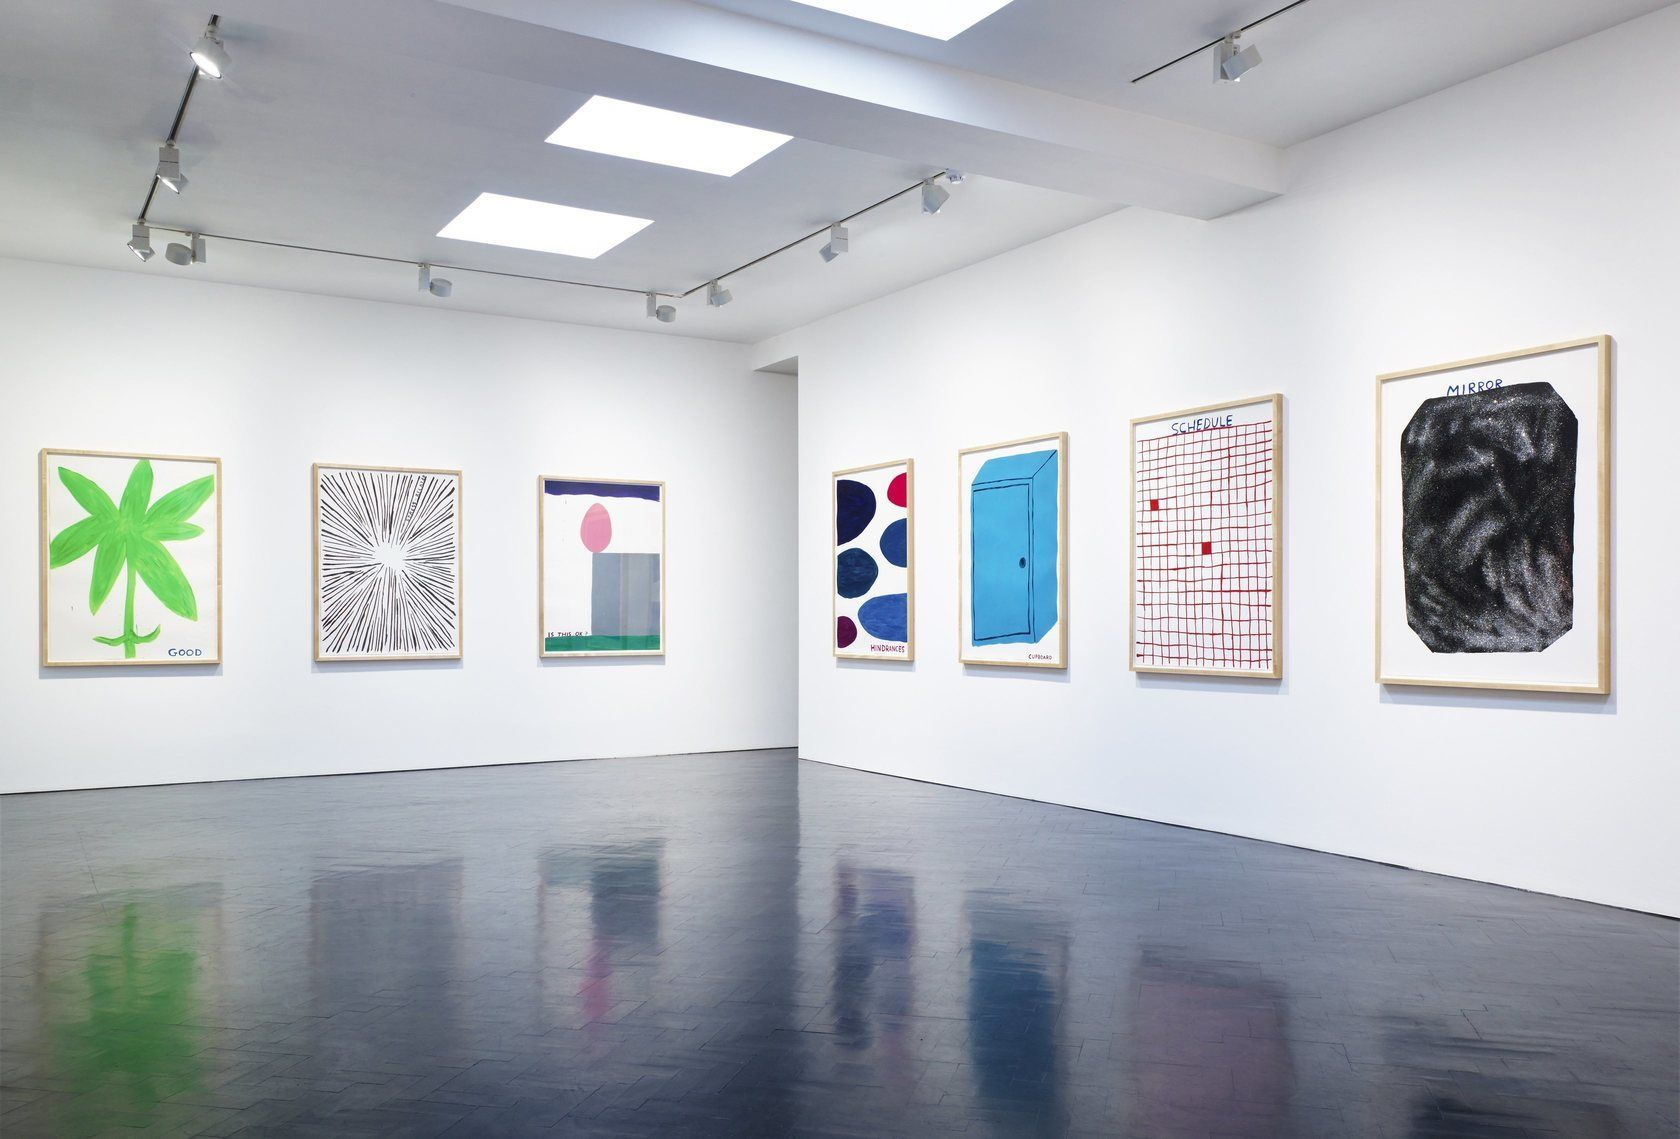 david-shrigley-paintings-and-drawings-2016-01